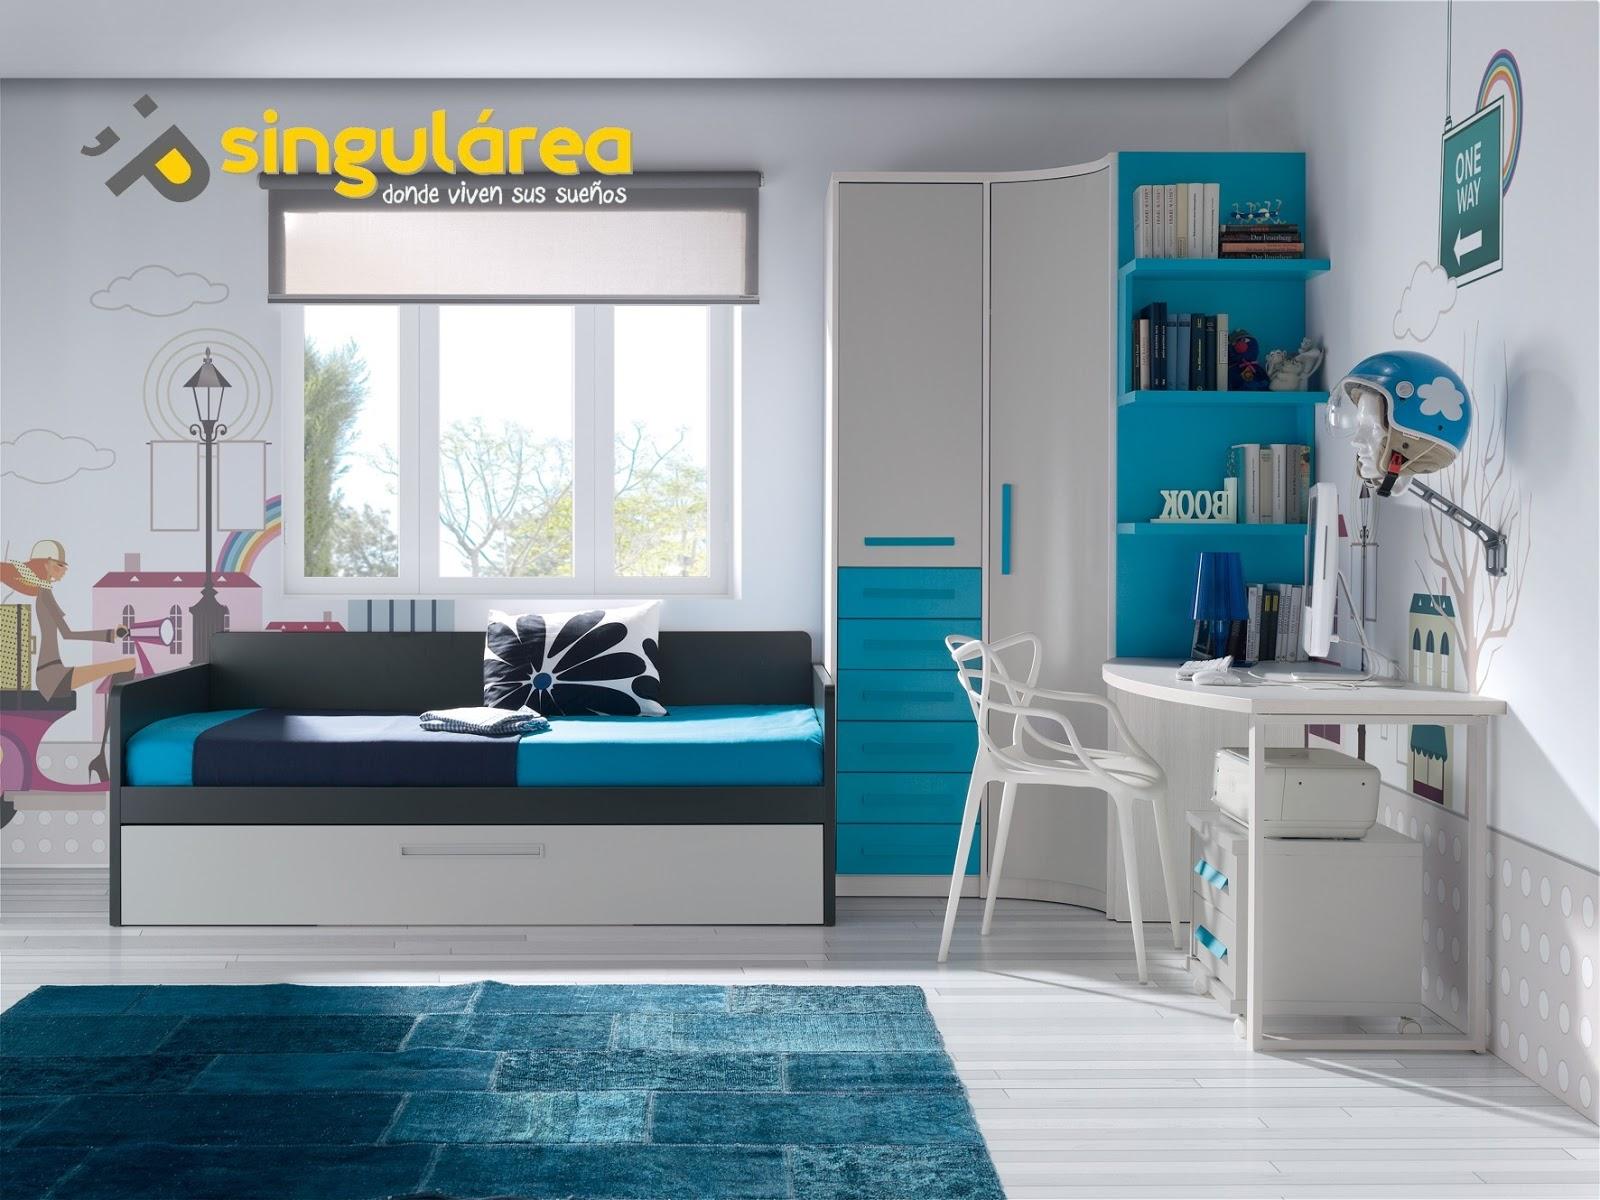 Habitaciones juveniles nino dise os arquitect nicos - Dormitorio juvenil nino ...